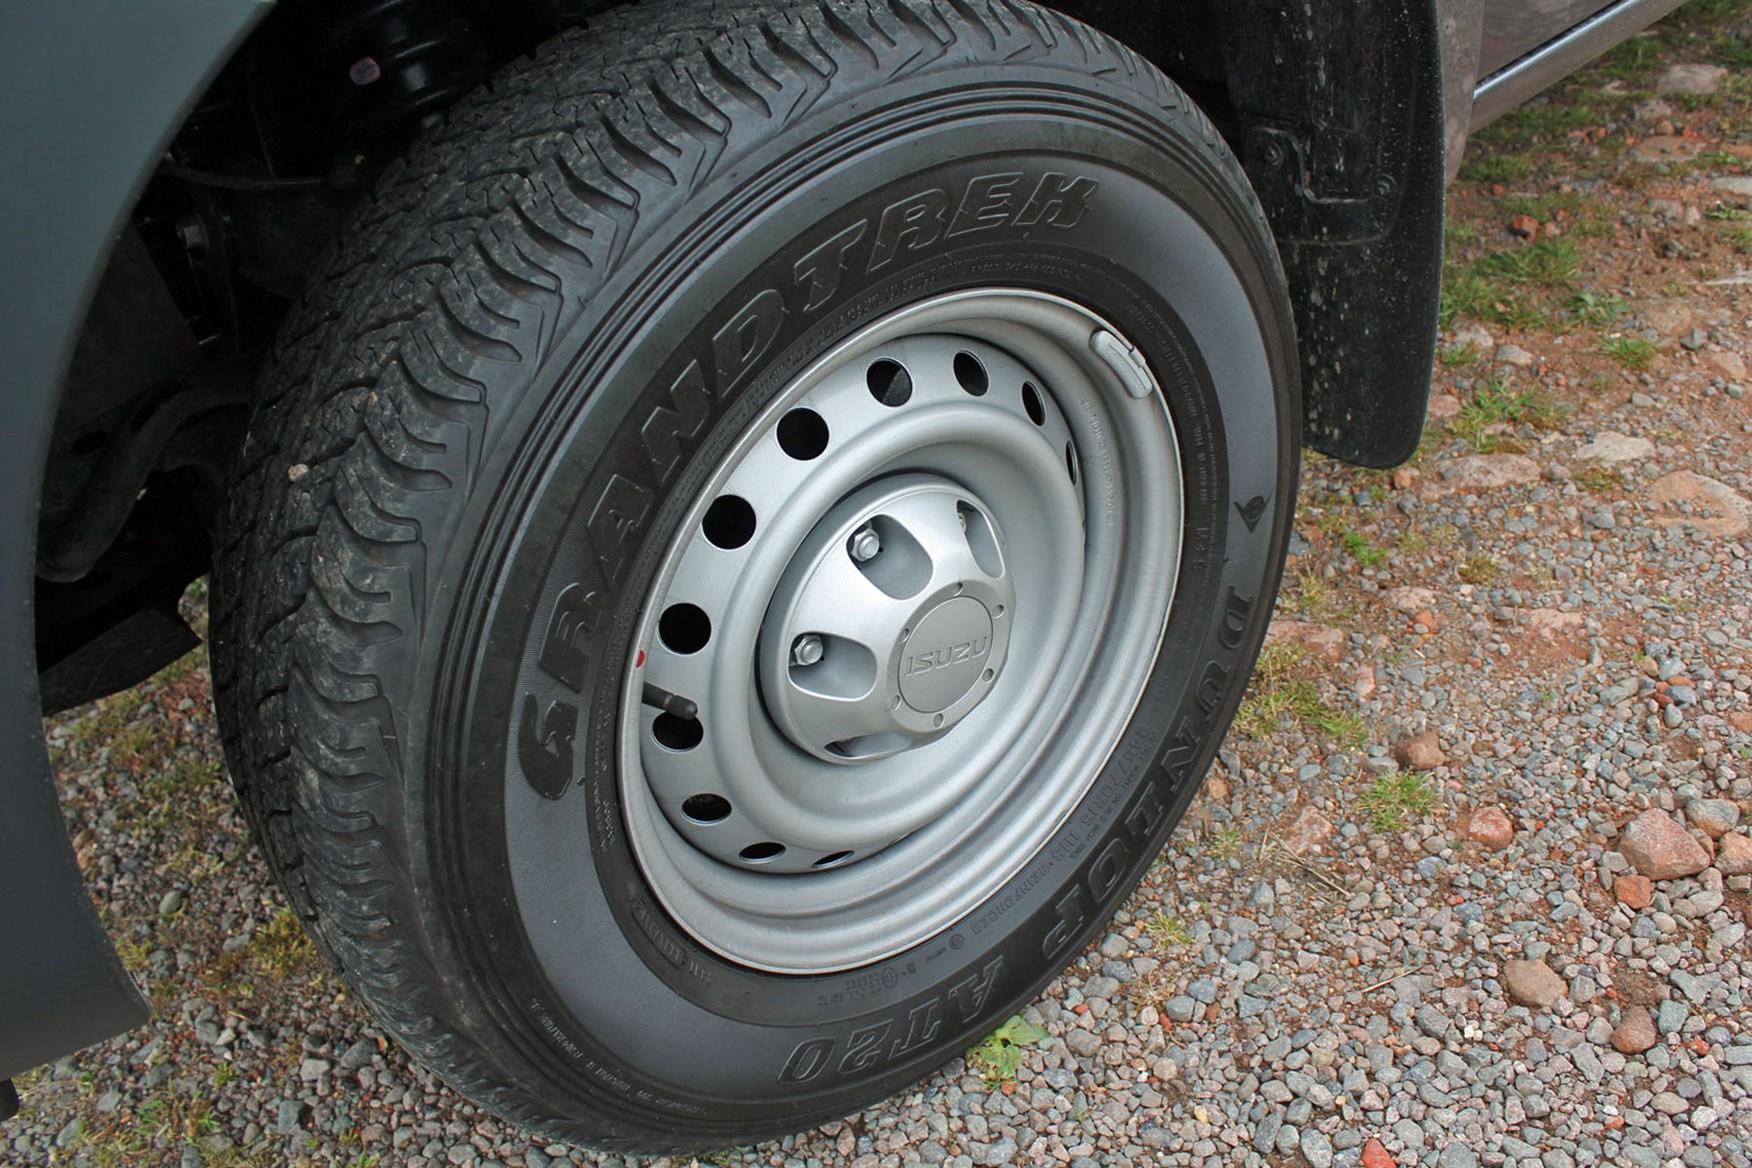 Isuzu D-Max Utility 1.9 review - steel wheels